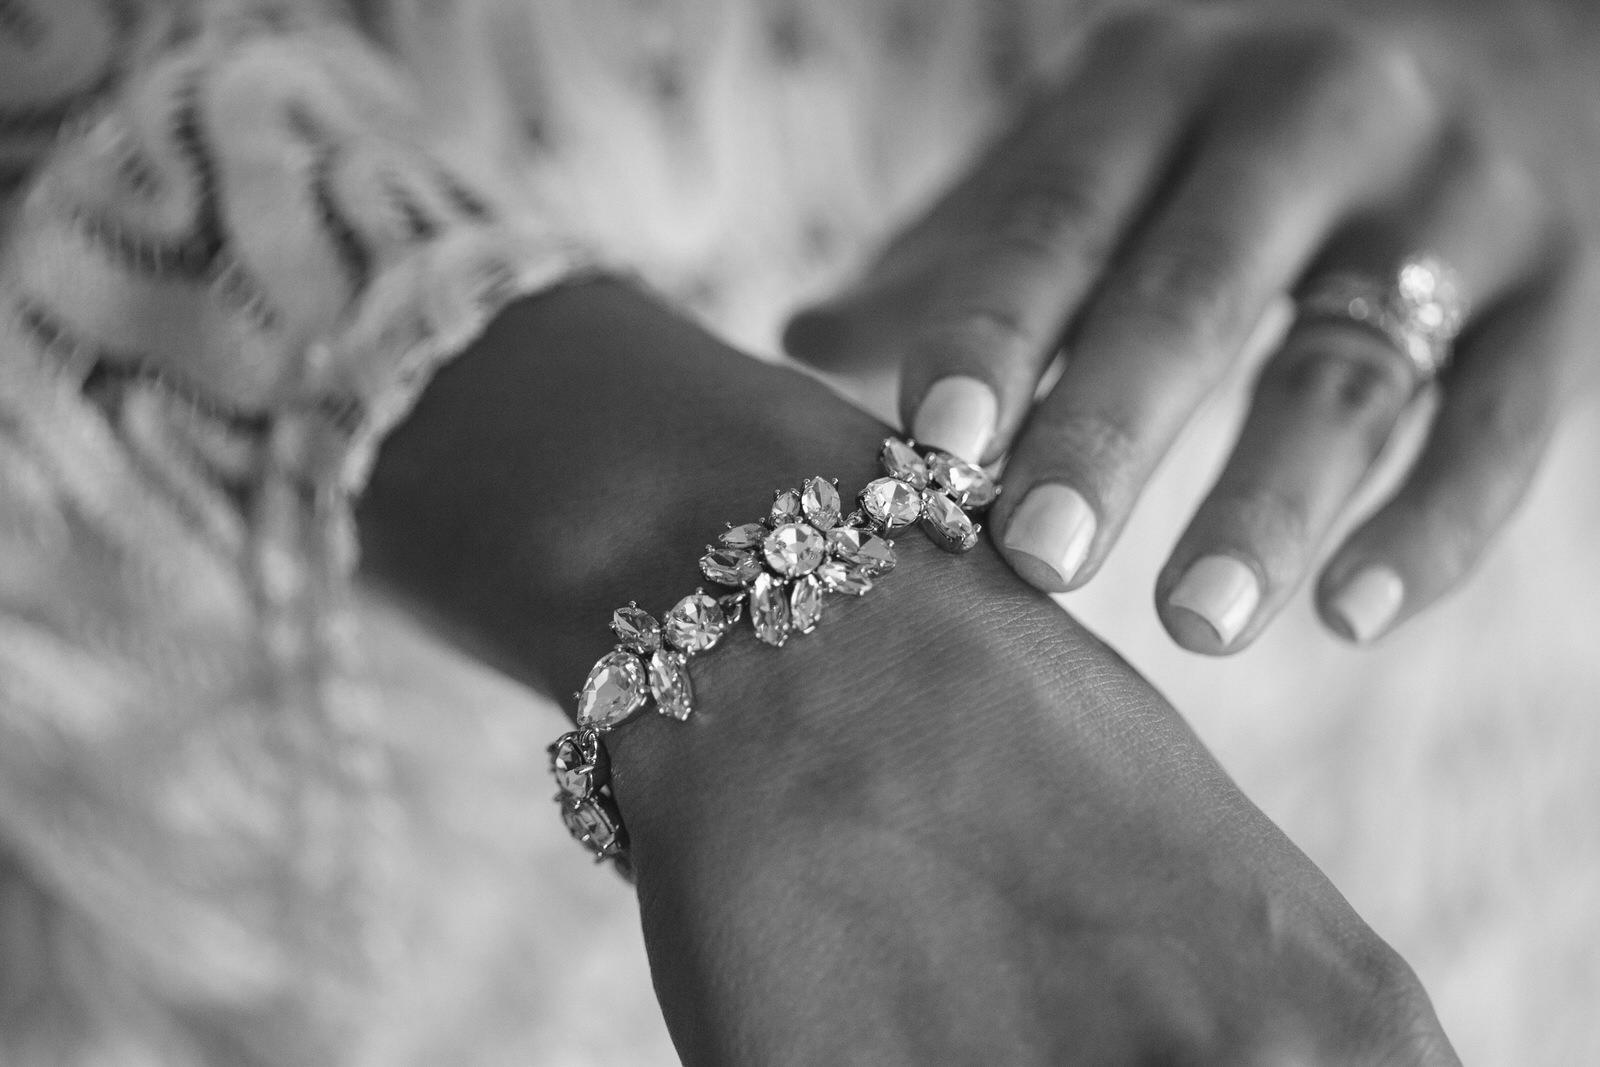 bride_bracelet_tiny_house_photo.jpg